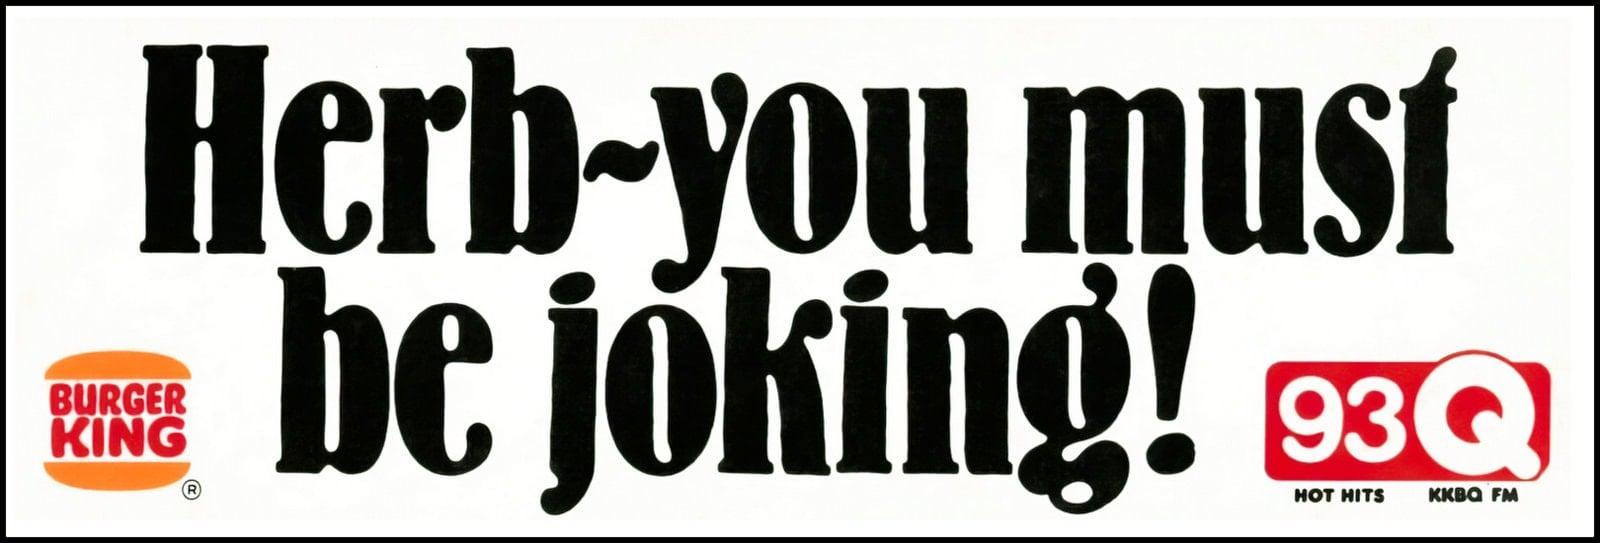 Herb you must be joking - Vintage Burger King bumper sticker